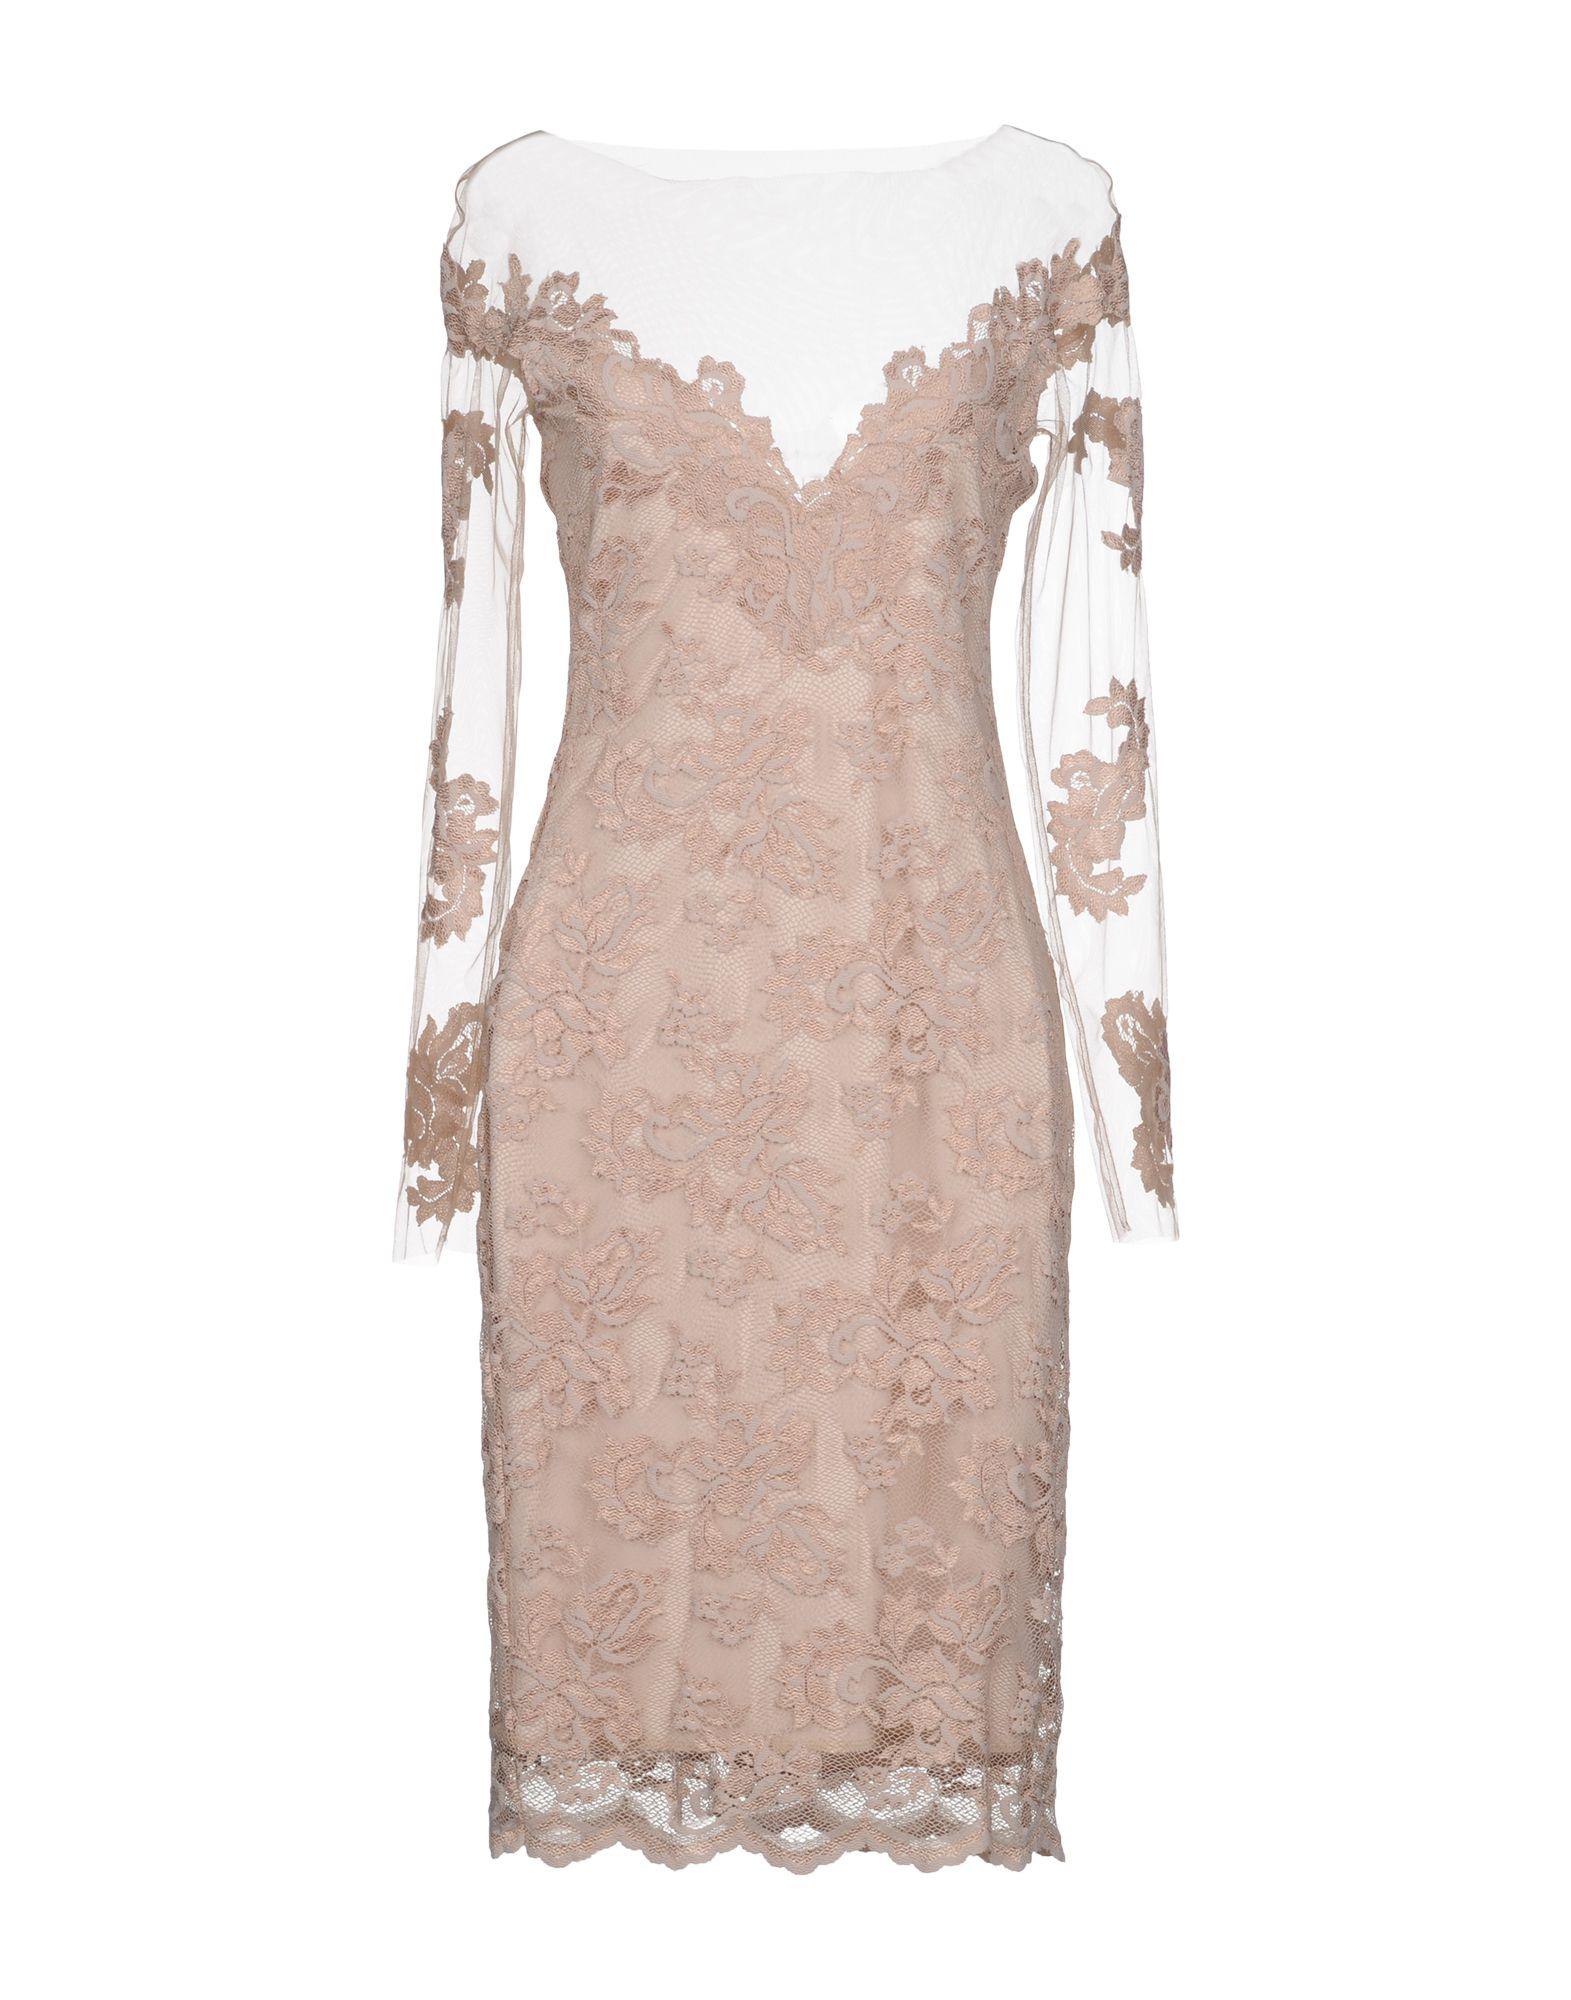 OLVI S Knee-Length Dress in Beige